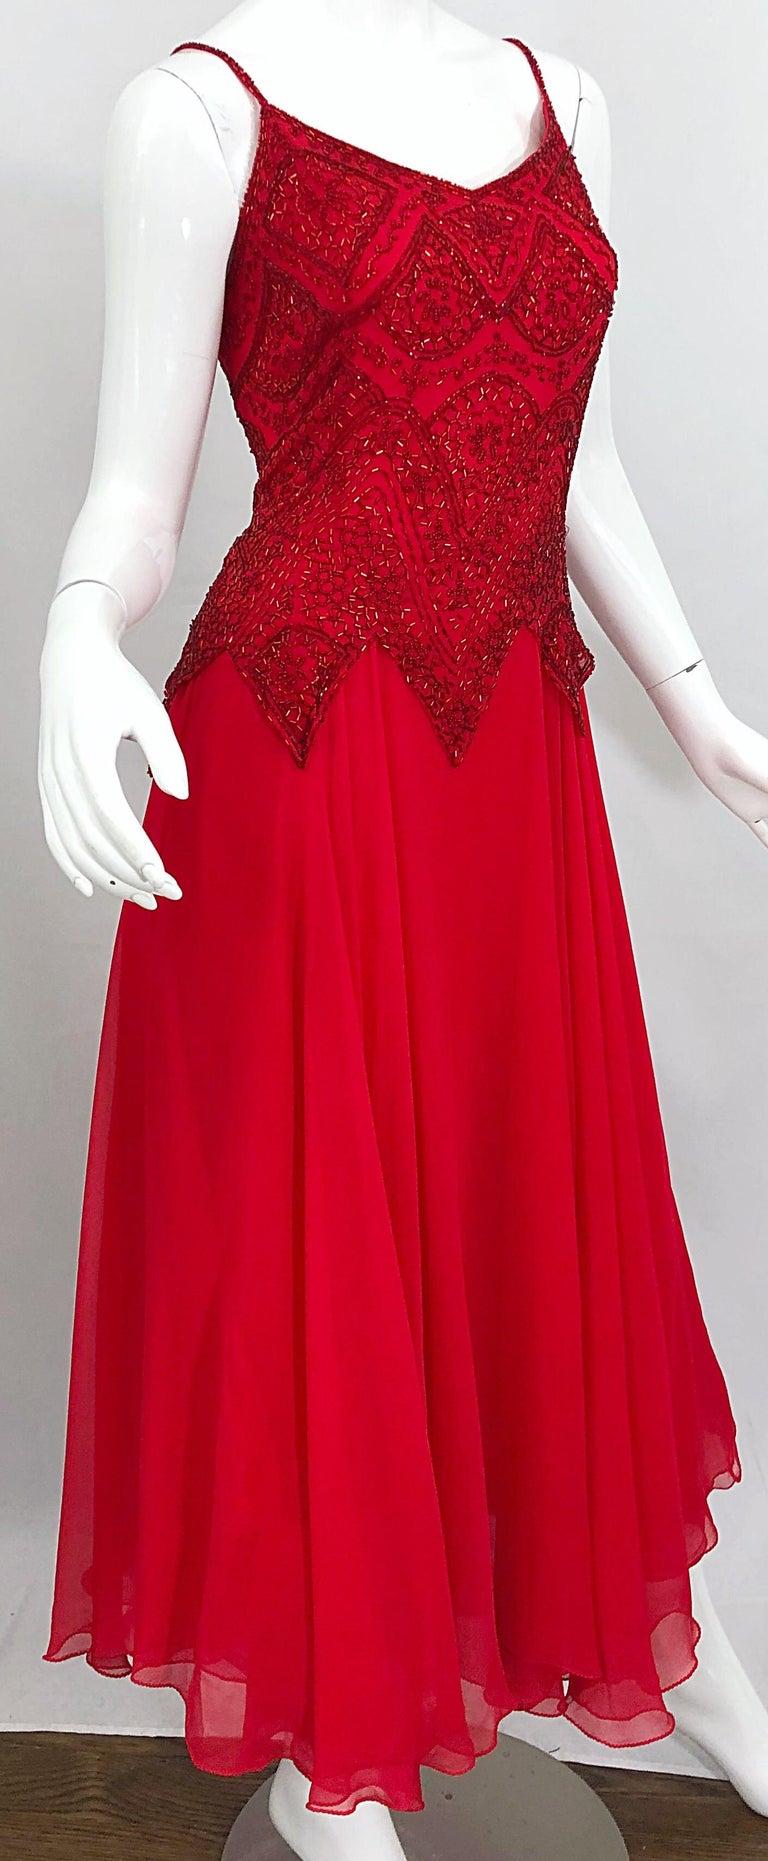 1970s Oleg Cassini Size 10 / 12 Red Silk Chiffon Beaded Handkerchief Midi Dress For Sale 8